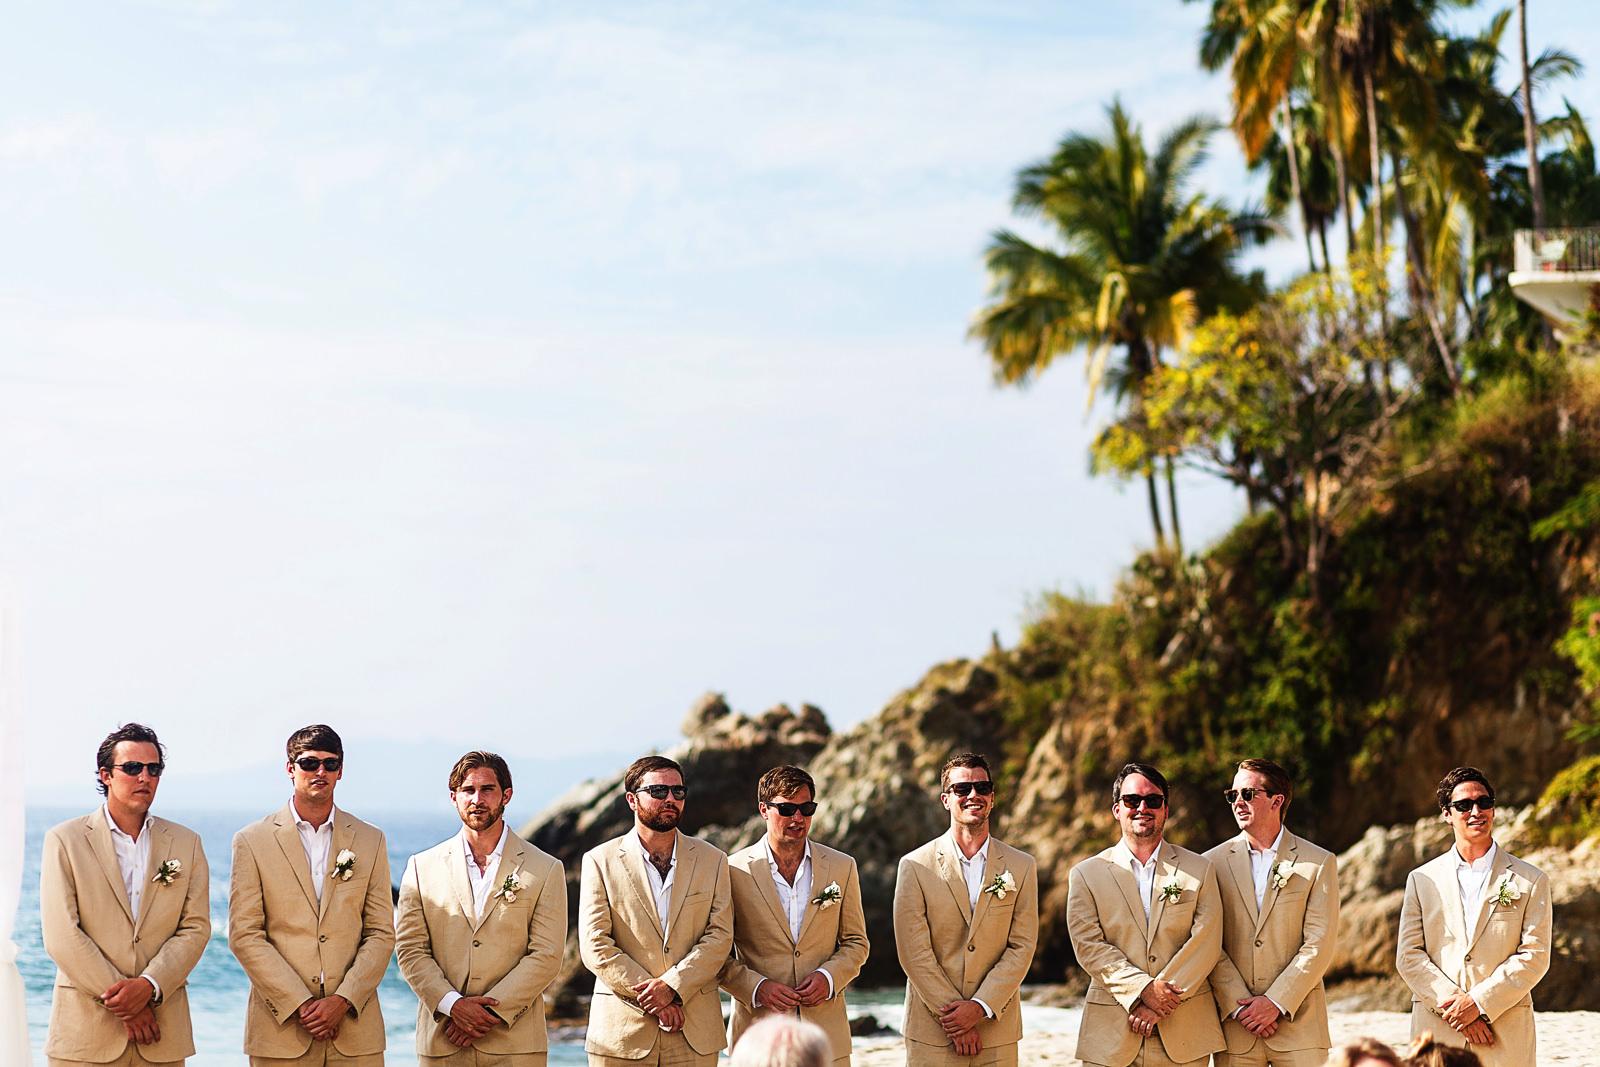 Groomsmen in place for wedding ceremony - Eder Acevedo cancun los cabos vallarta wedding photographer